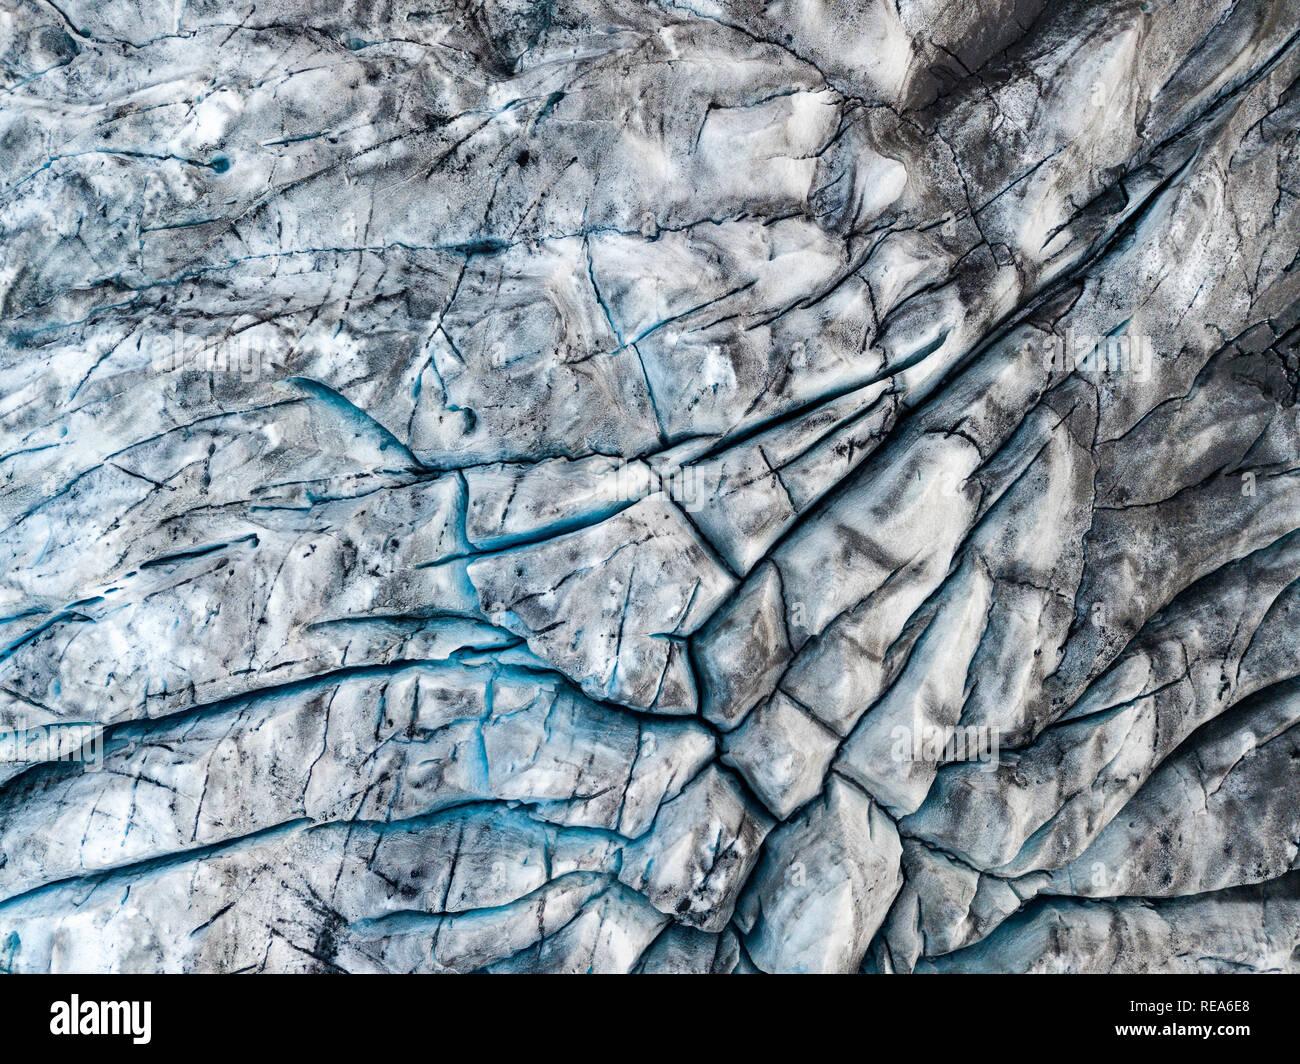 Drone view of the Fjallsarlon iceberg glacier lagoon in Iceland. Vatnajokull glacier aerial dramatic winter scene. - Stock Image